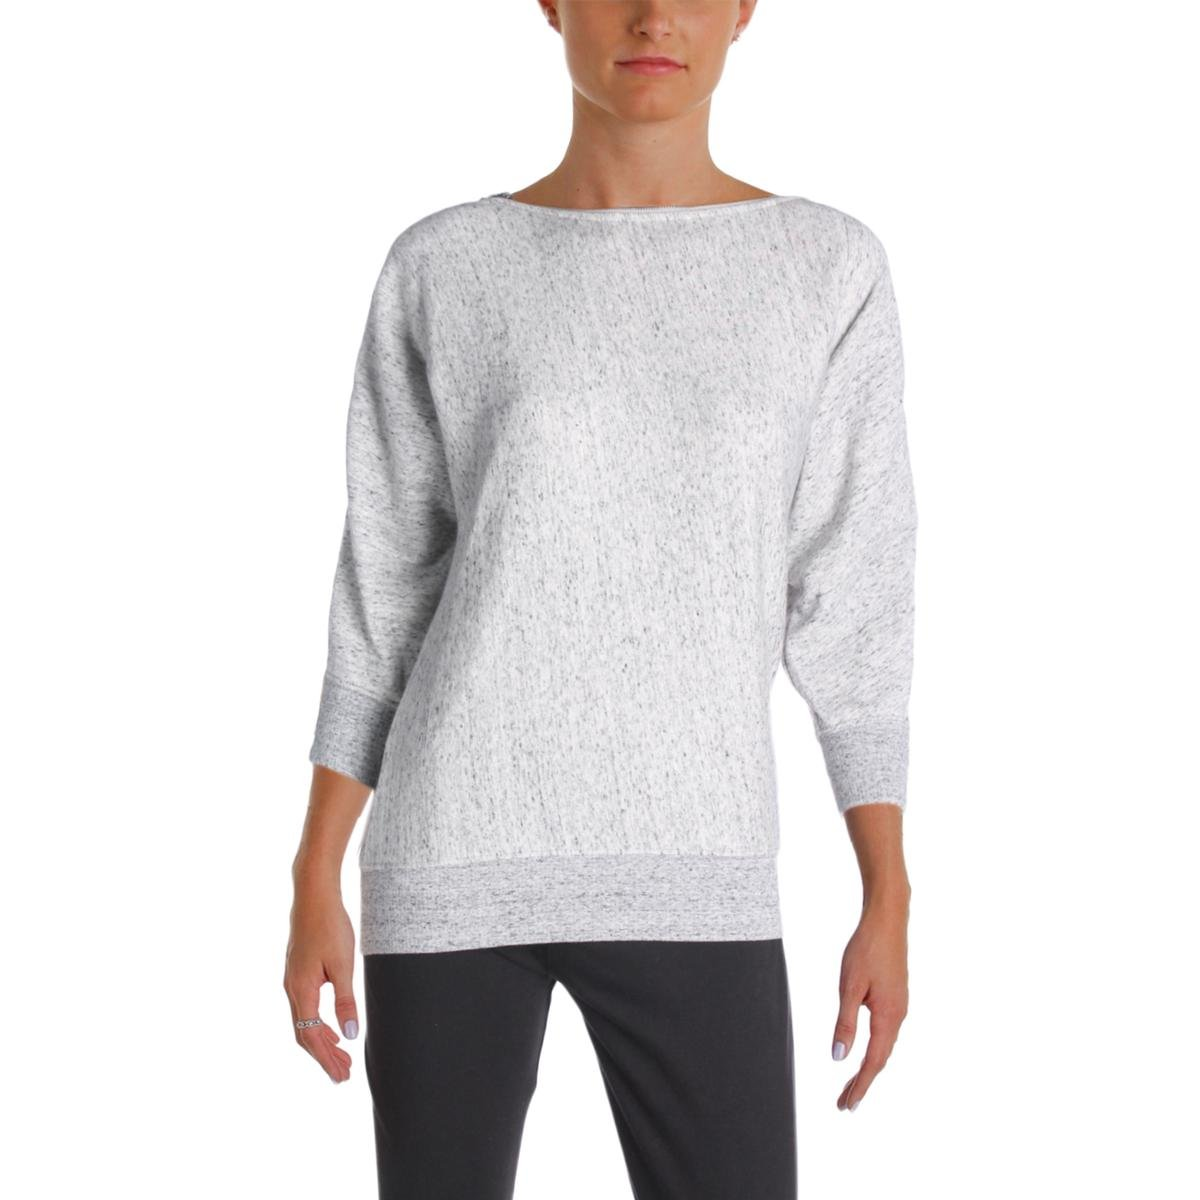 Grey State Womens Marled Zippered Sweatshirt Gray XL